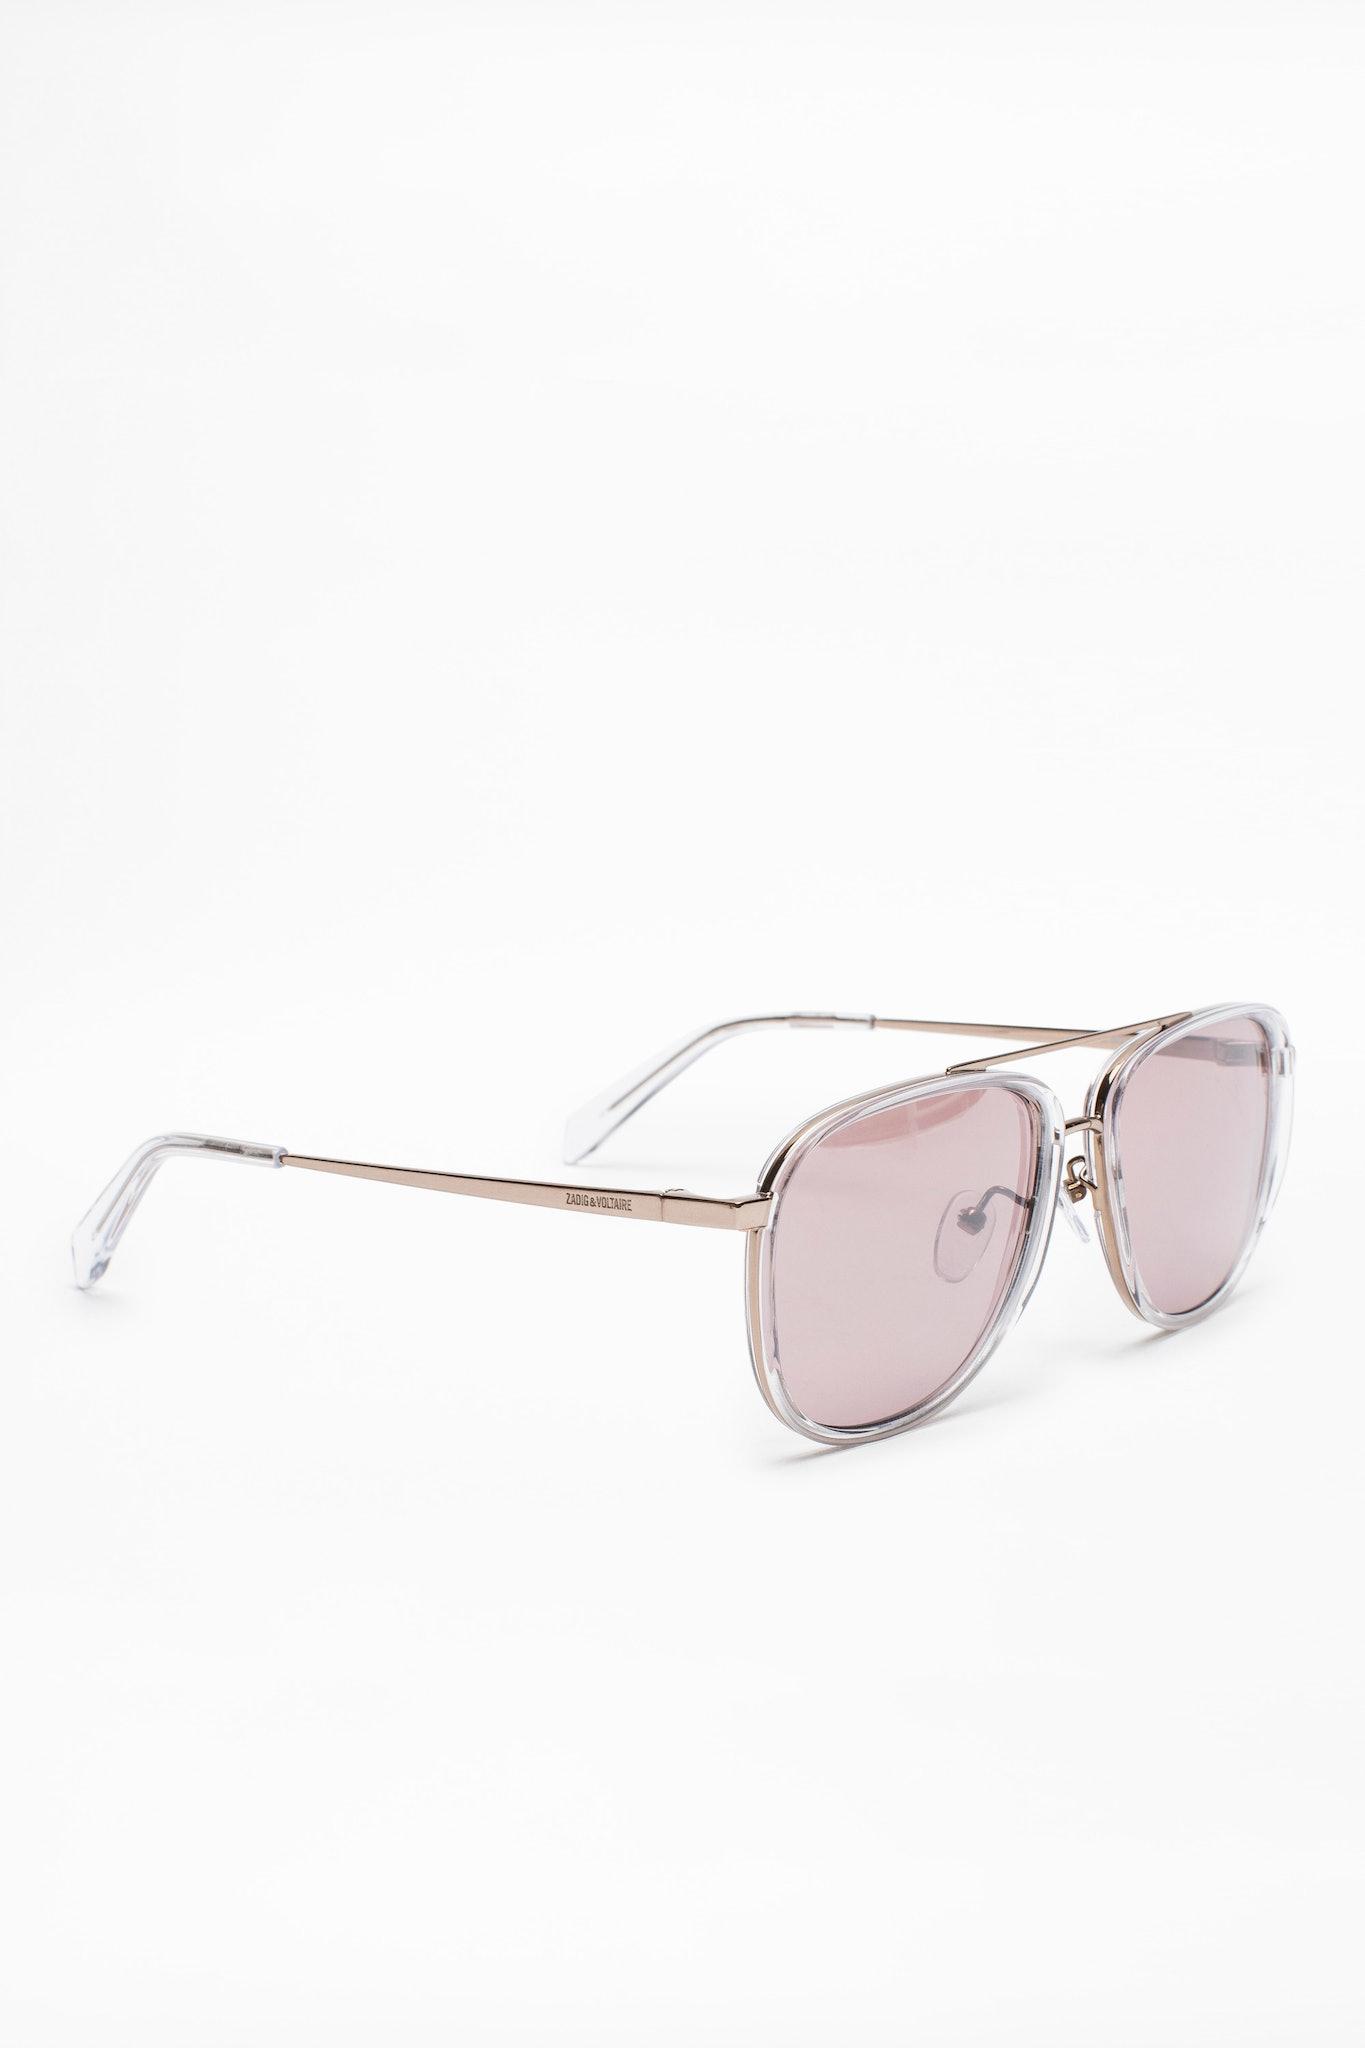 SZV194 Sunglasses